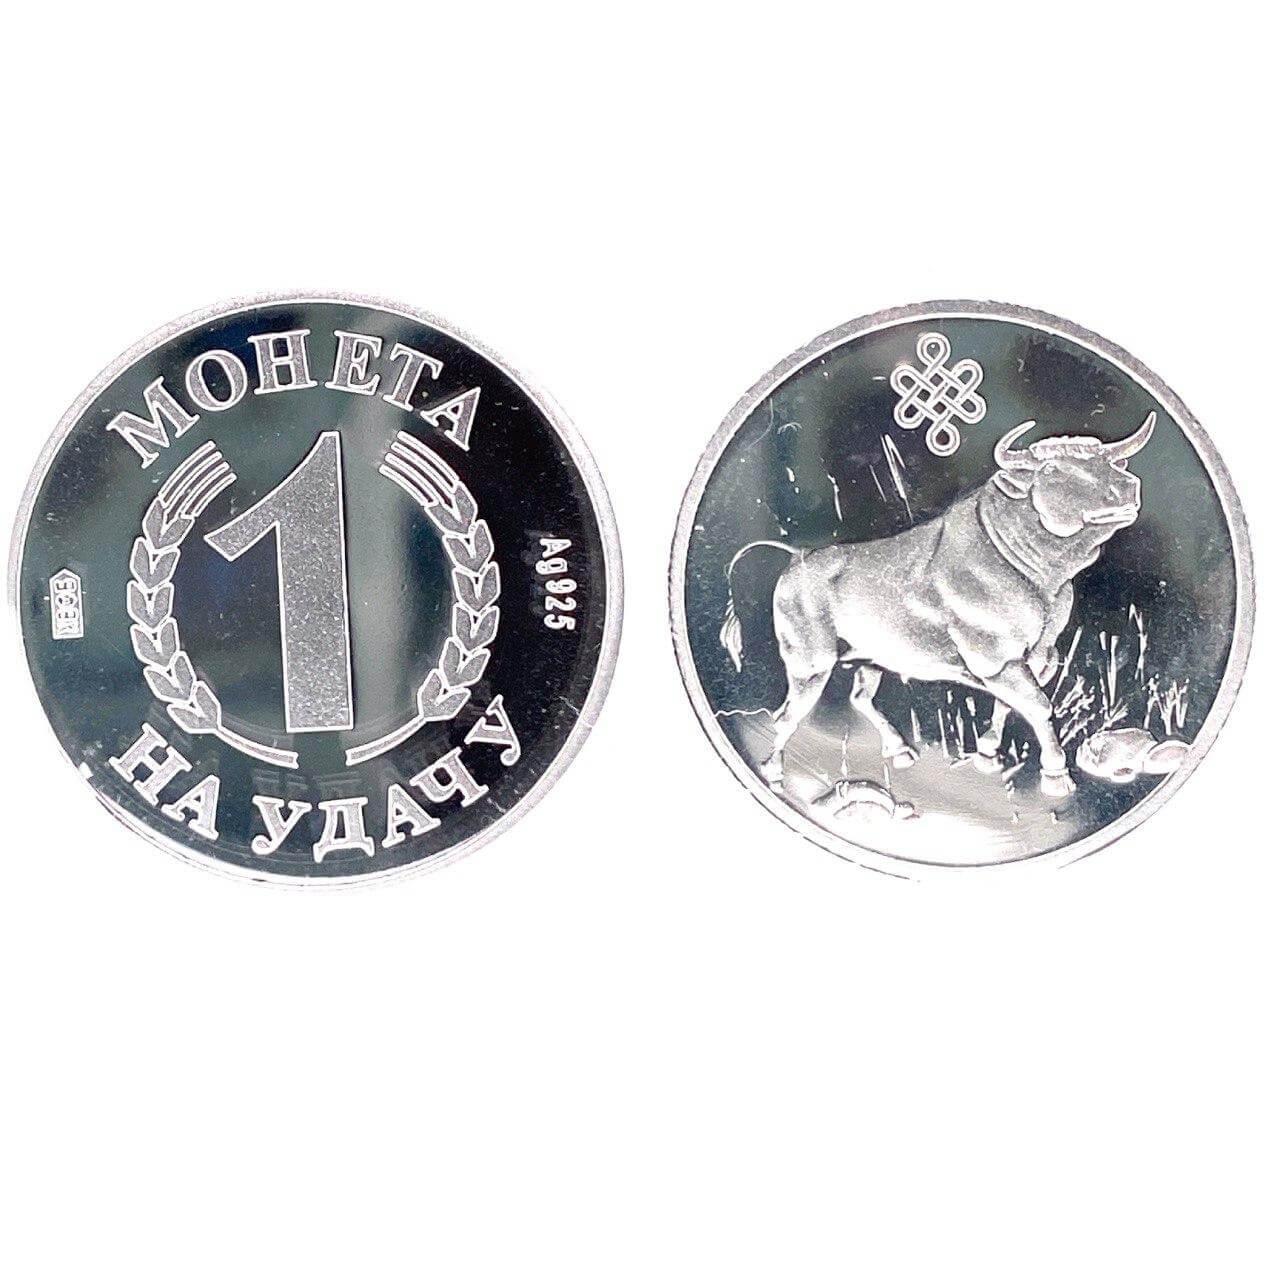 Серебряная монета арт. 9300409024 9300409024